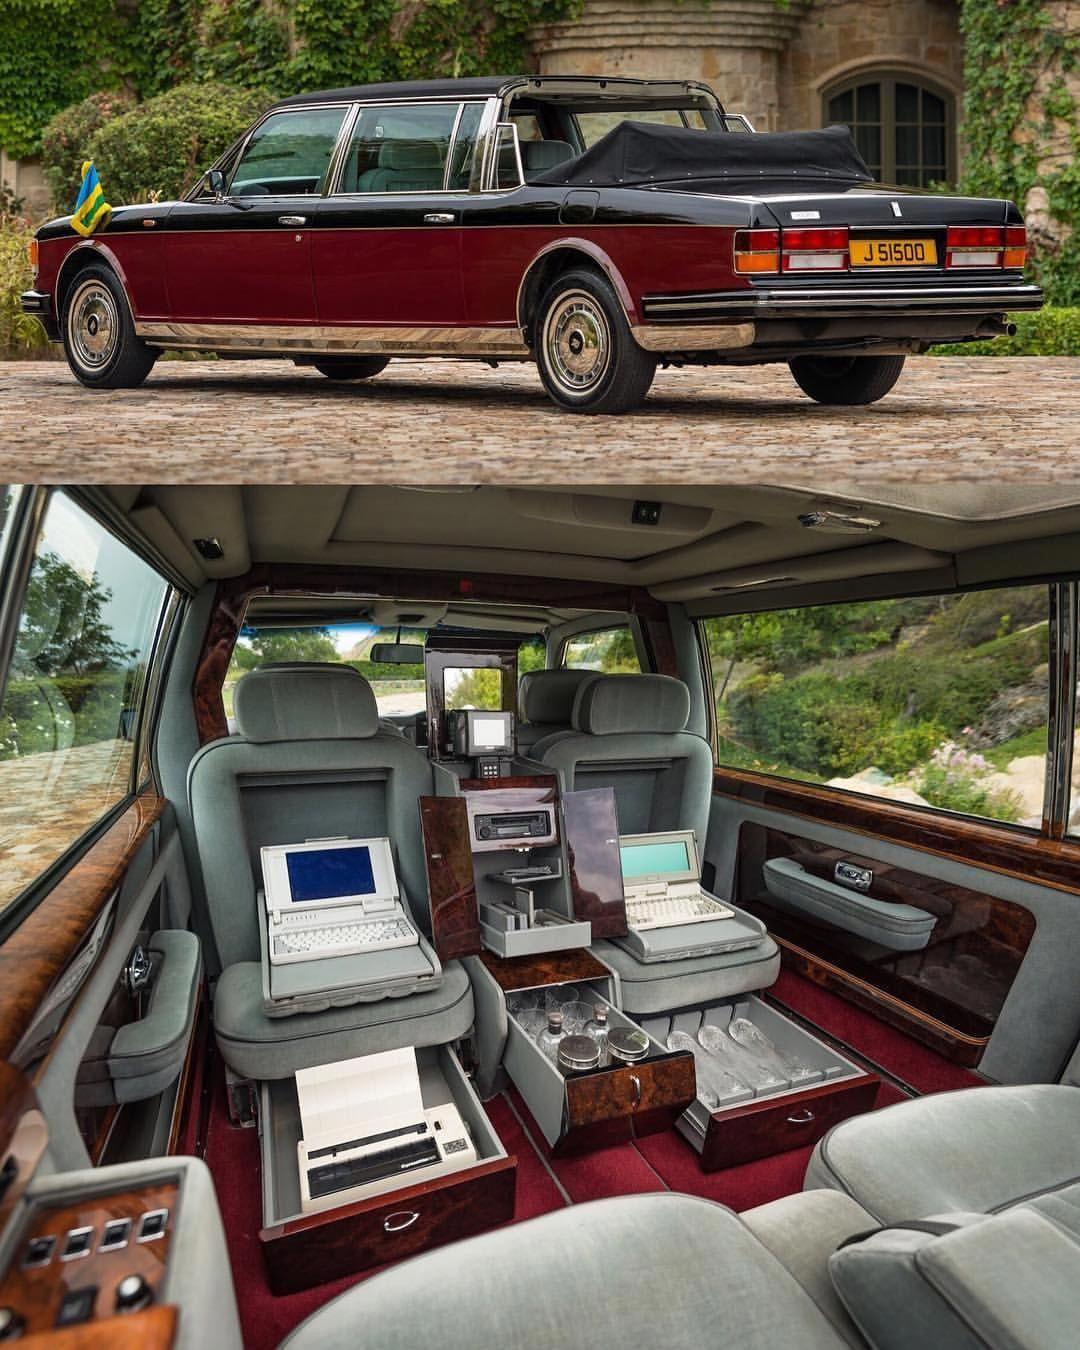 1989 Rolls-Royce Silver Spirit I Emperor State Landaulet